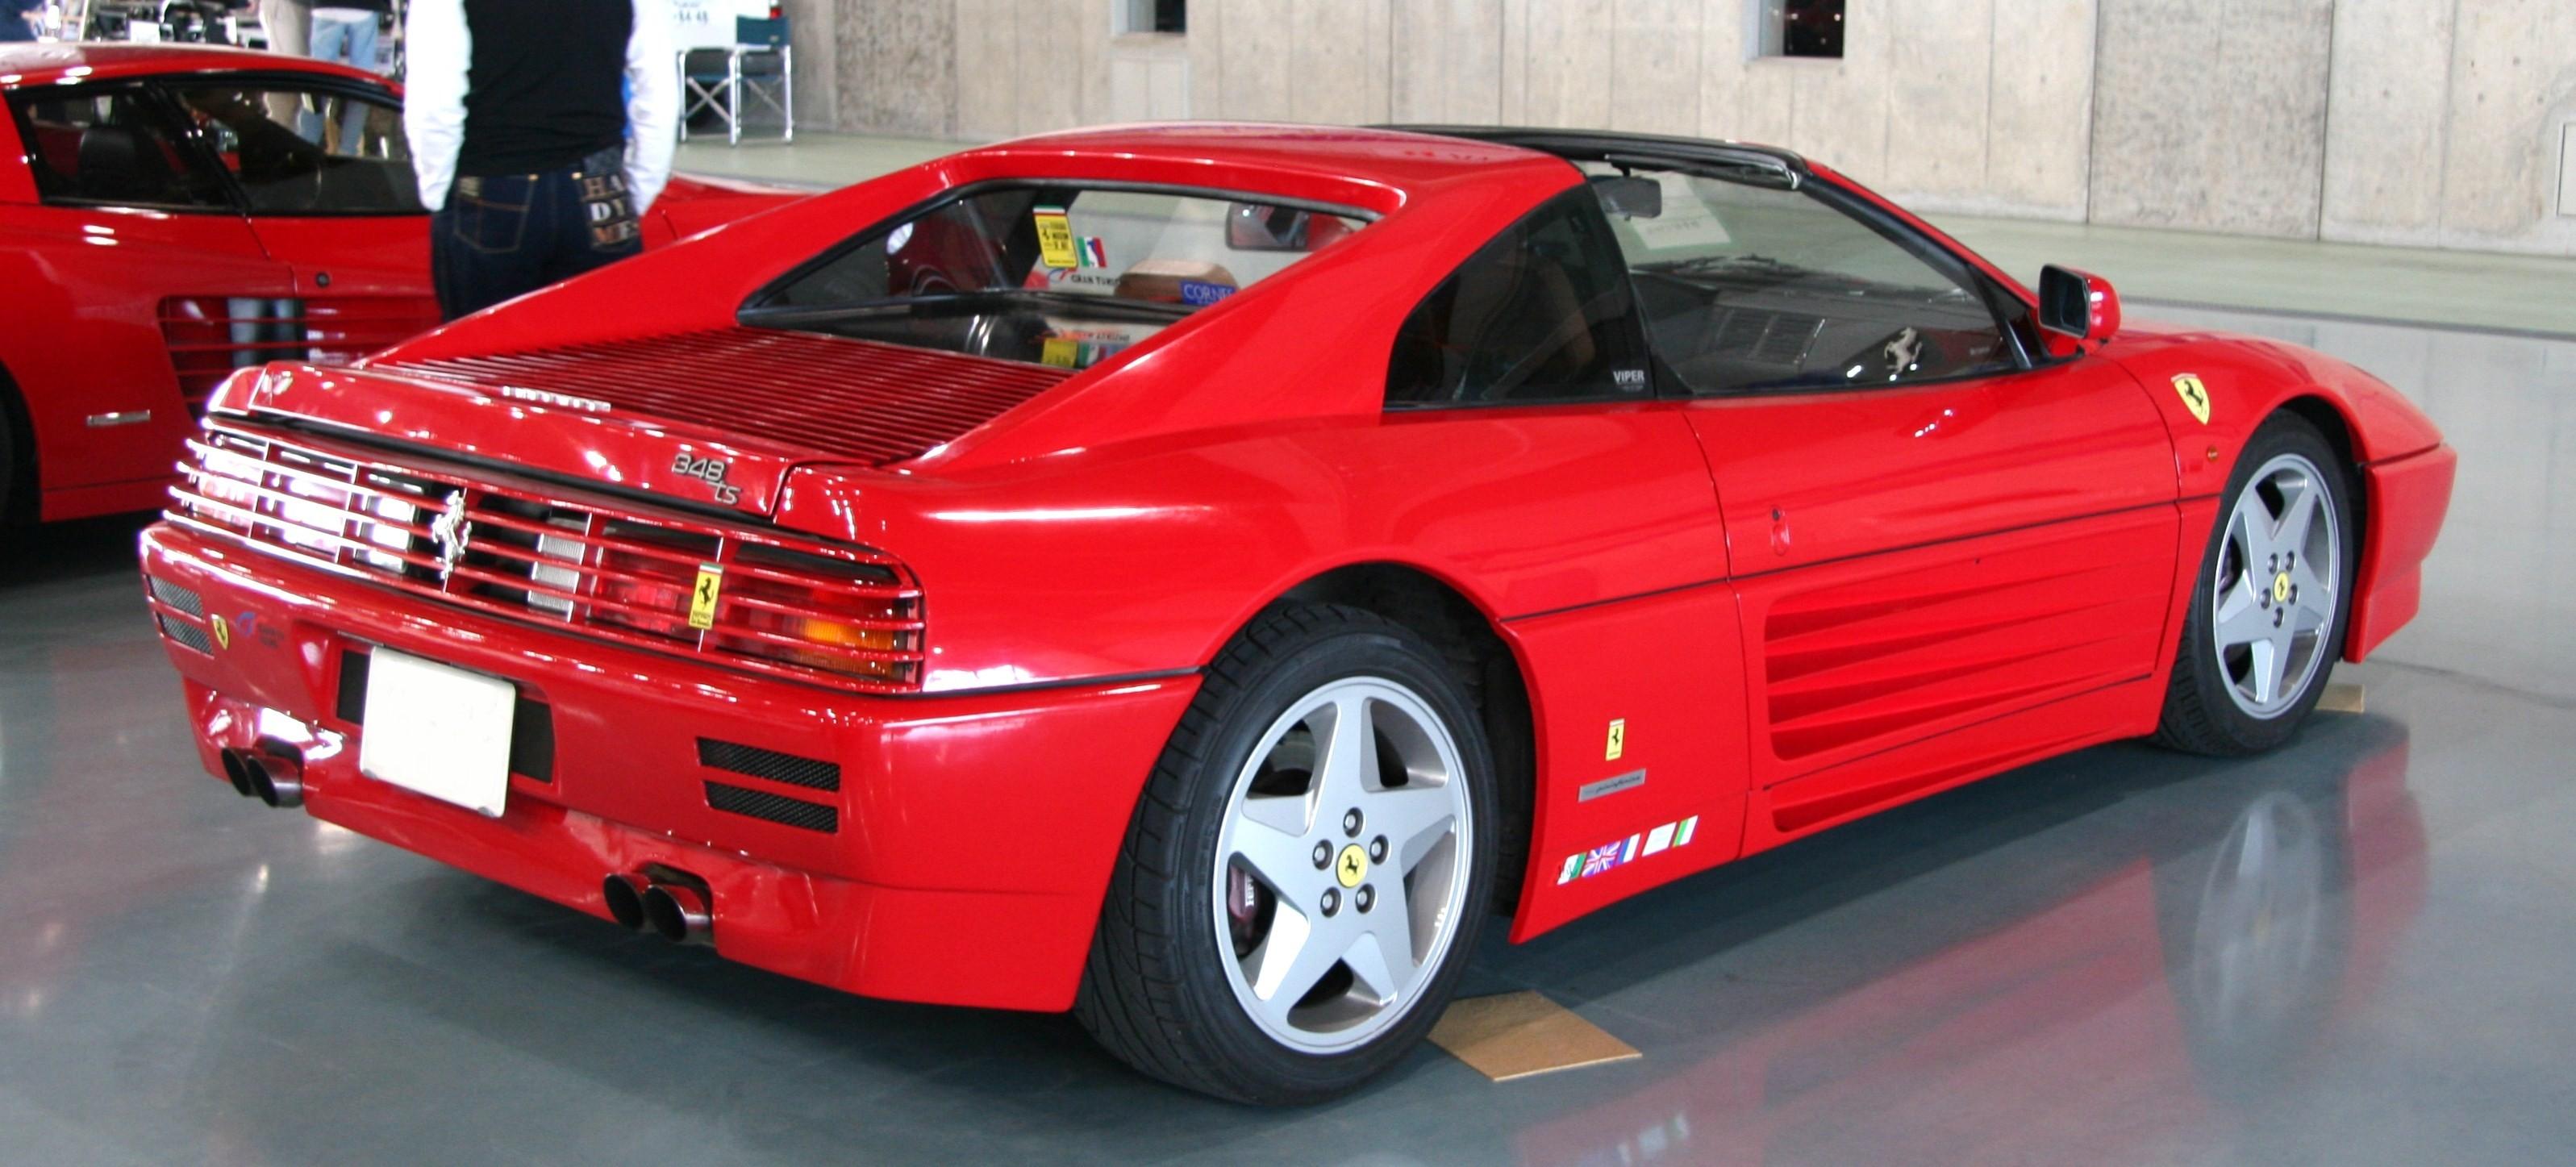 FERRARI 348 GTS (1993 - 1994) ...